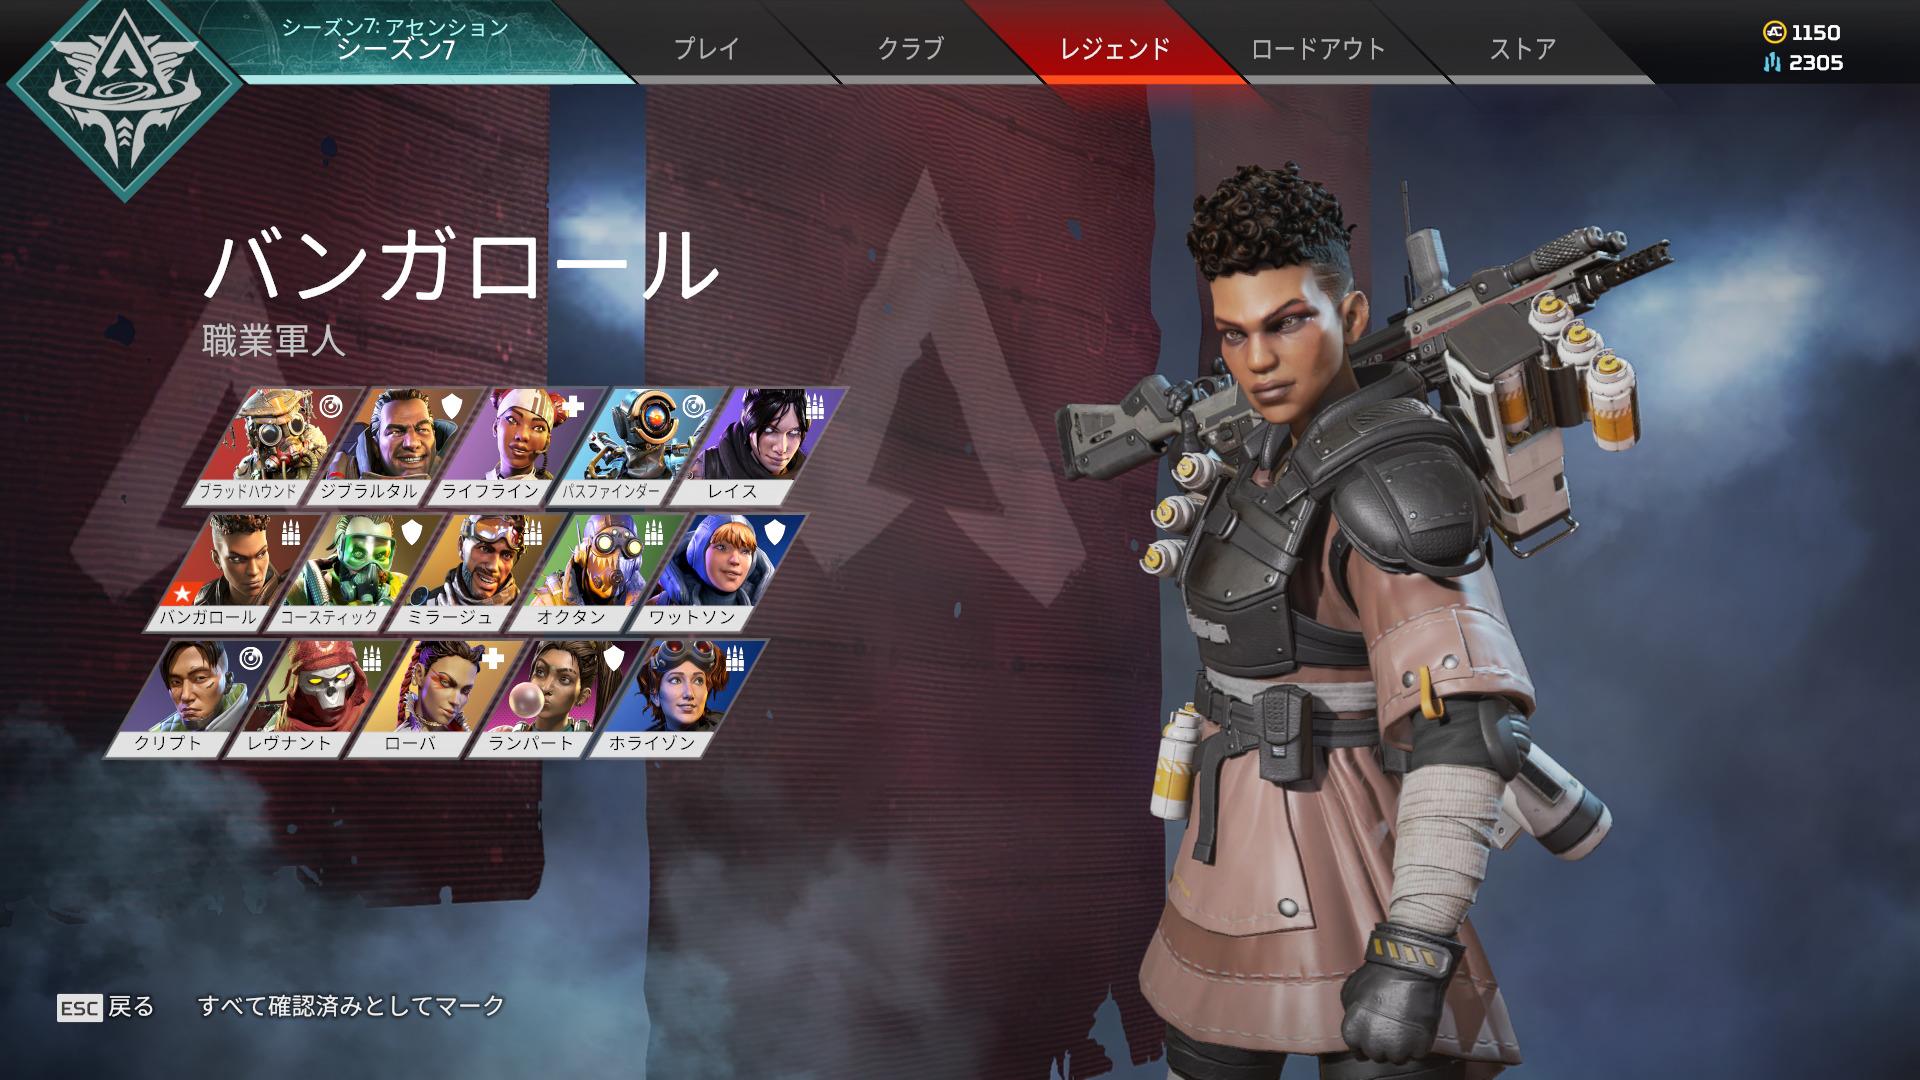 【Apex Legends】バンガロール 日本語セリフ一覧【基本ボイス】【エーペックスレジェンズ】